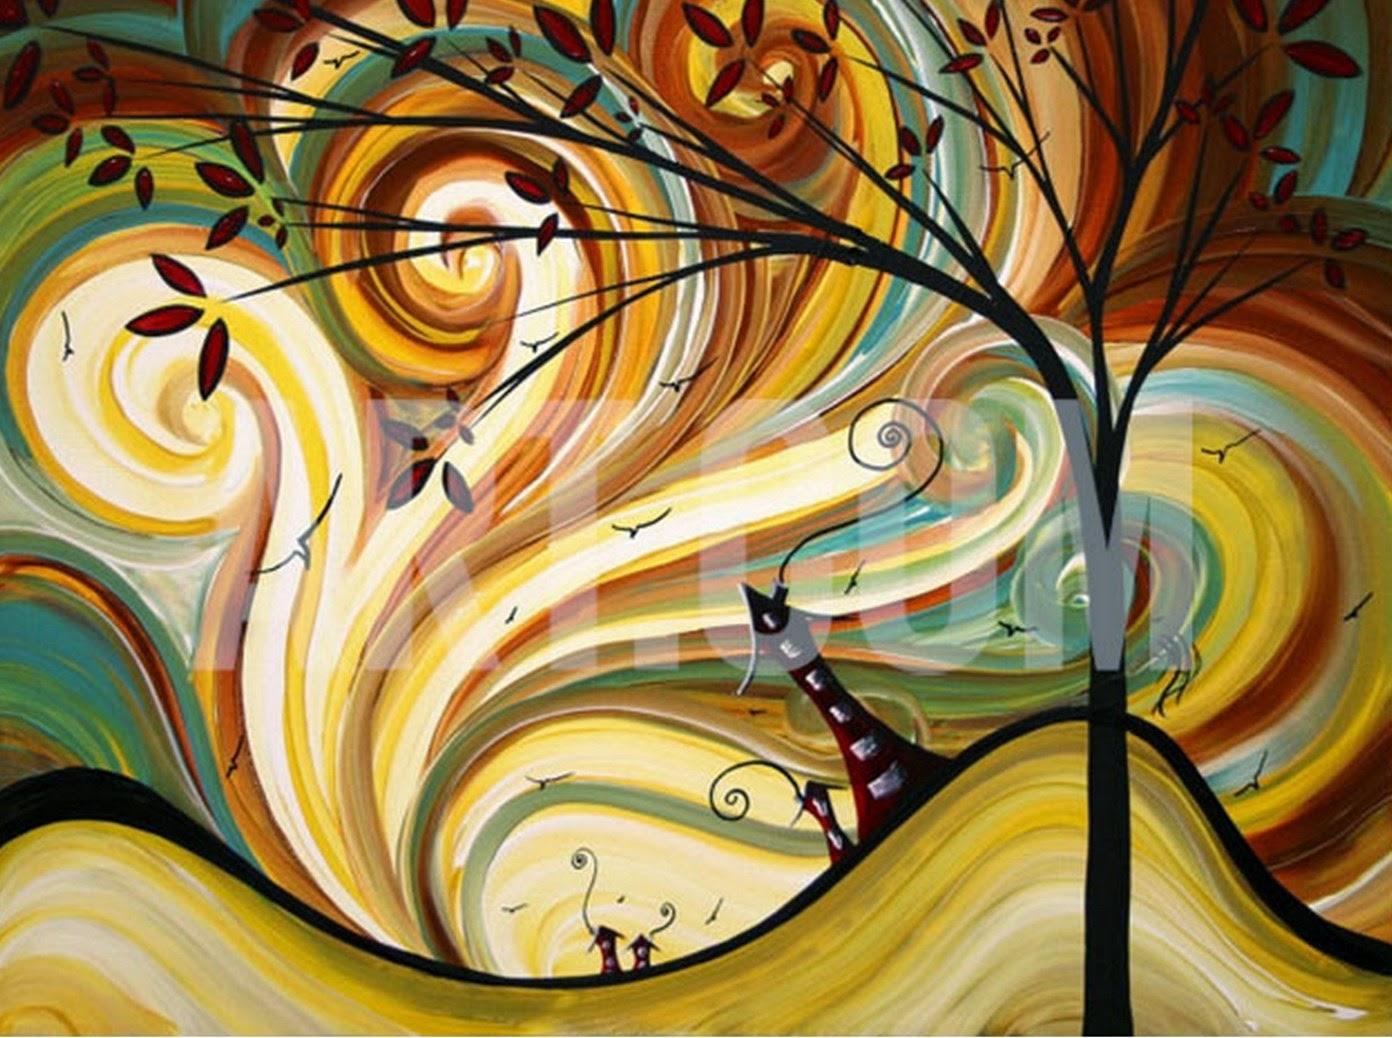 Pintura moderna y fotograf a art stica minimalismo - Cuadros modernos faciles de pintar ...